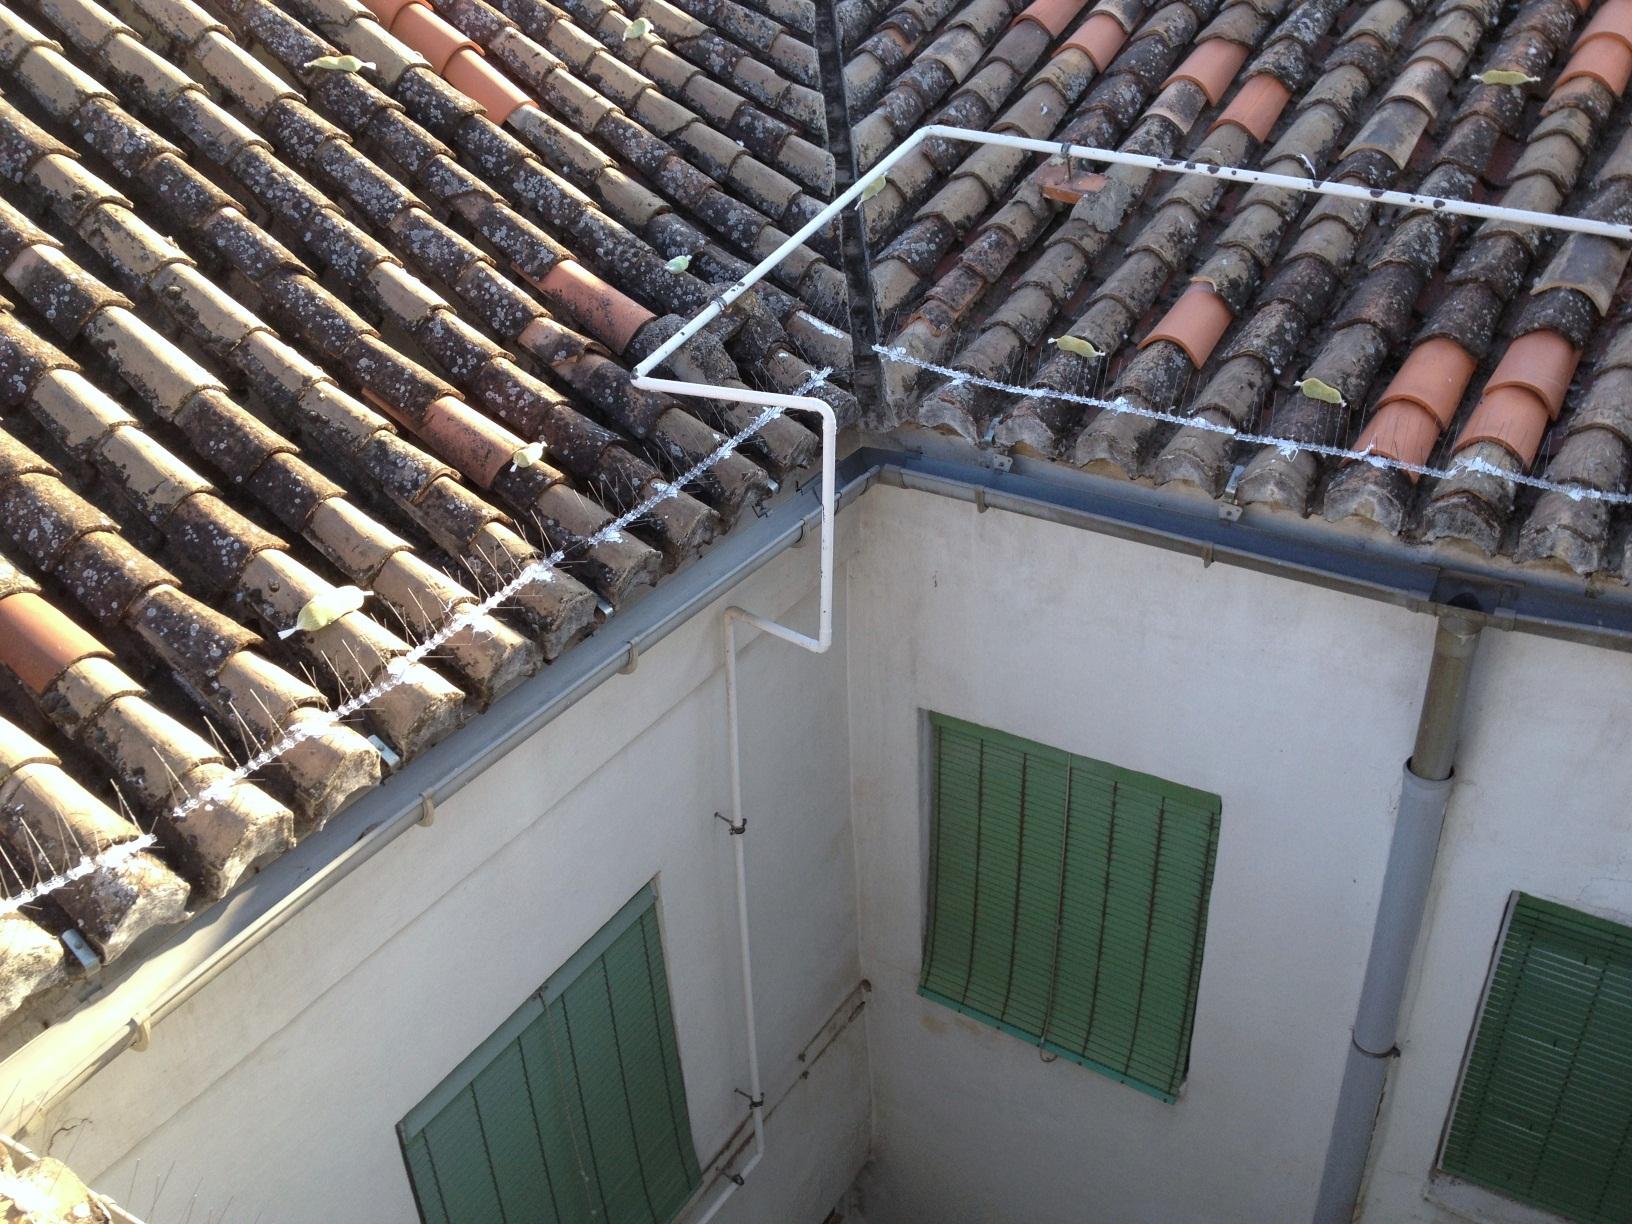 Alhambra vertical pinchos para palomas - Pinchos para palomas ...